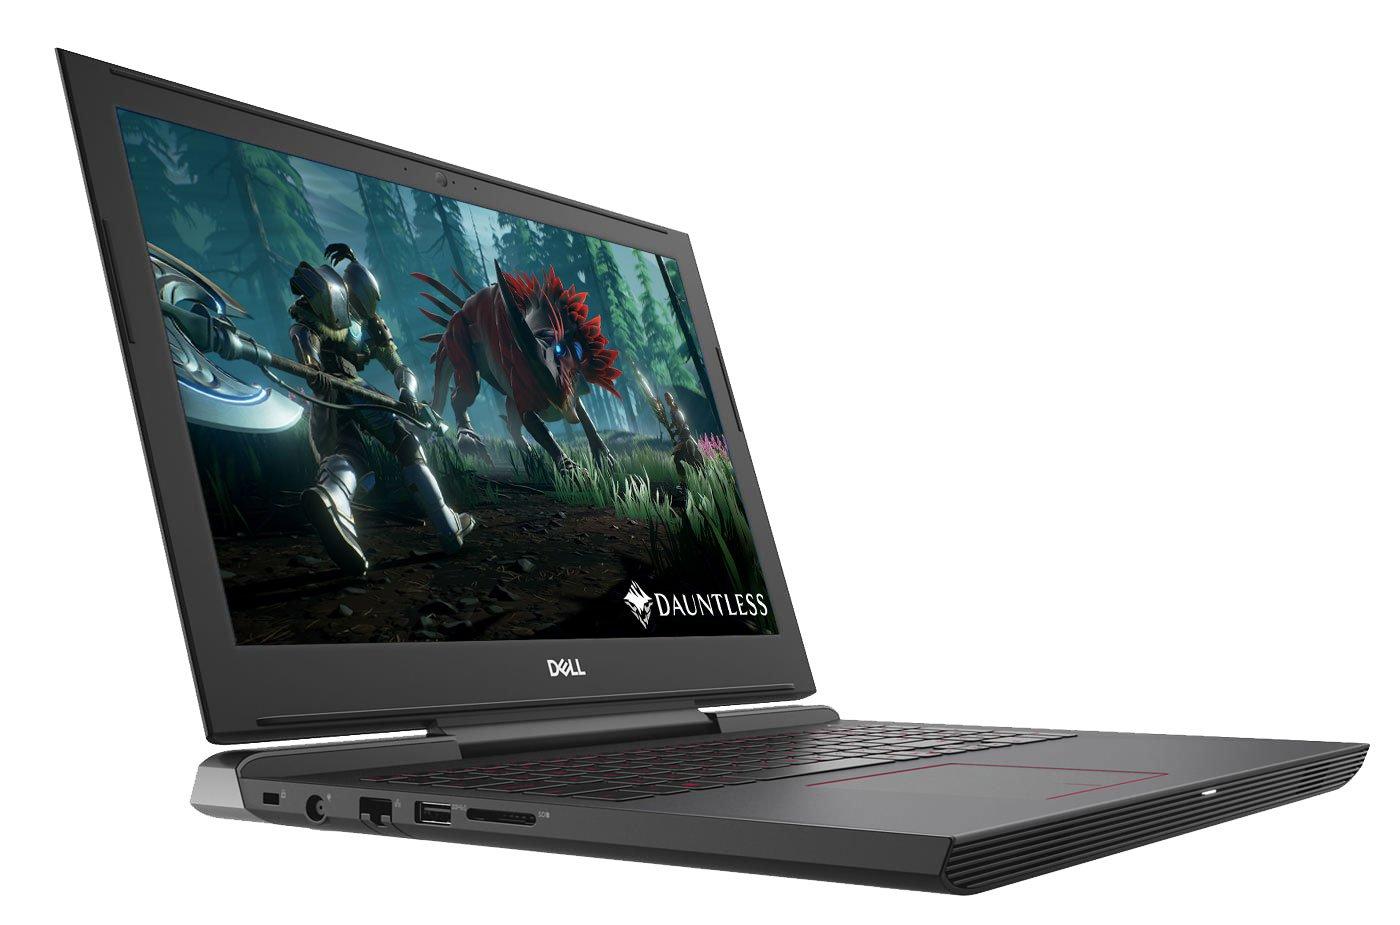 Dell Inspiron G5 Emocjonujący gaming z GeForce GTX 1060 Max-Q